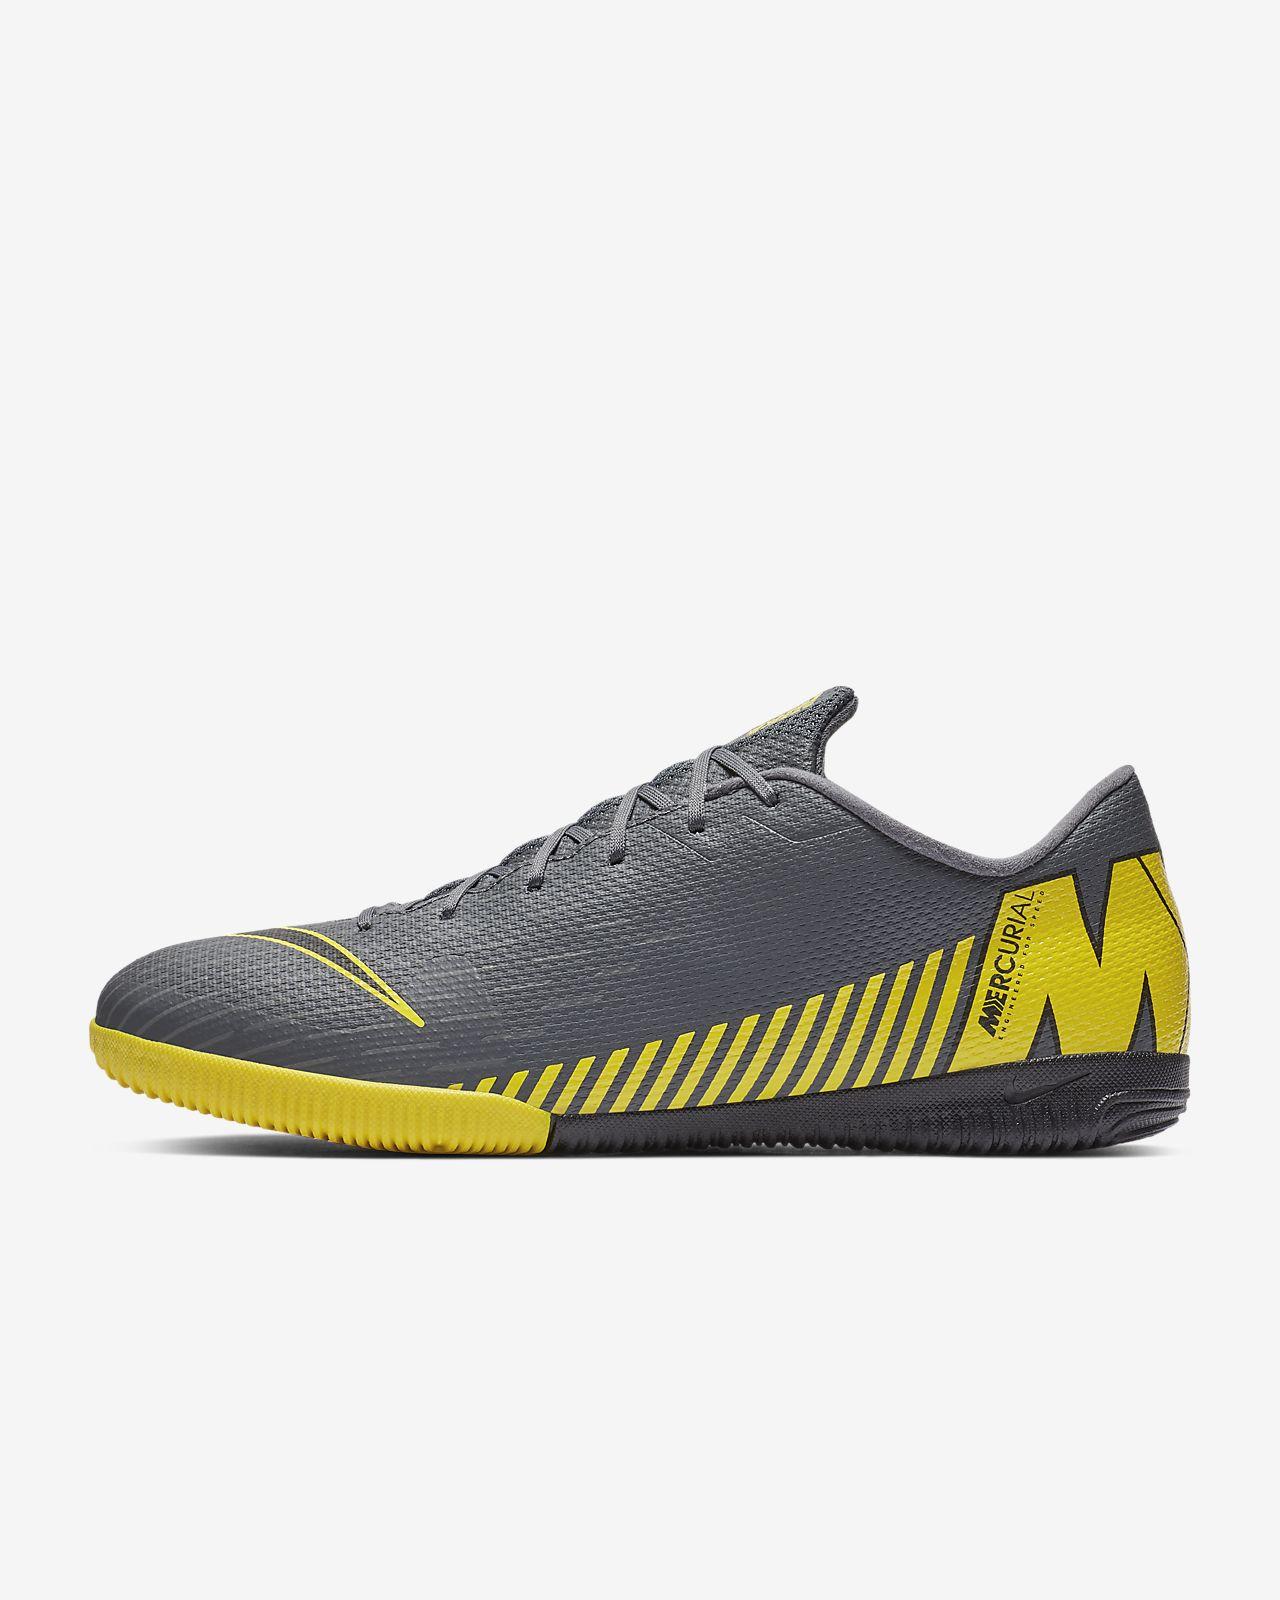 the best attitude 242bd 64984 Indoor Court Football Shoe. Nike VaporX 12 Academy IC